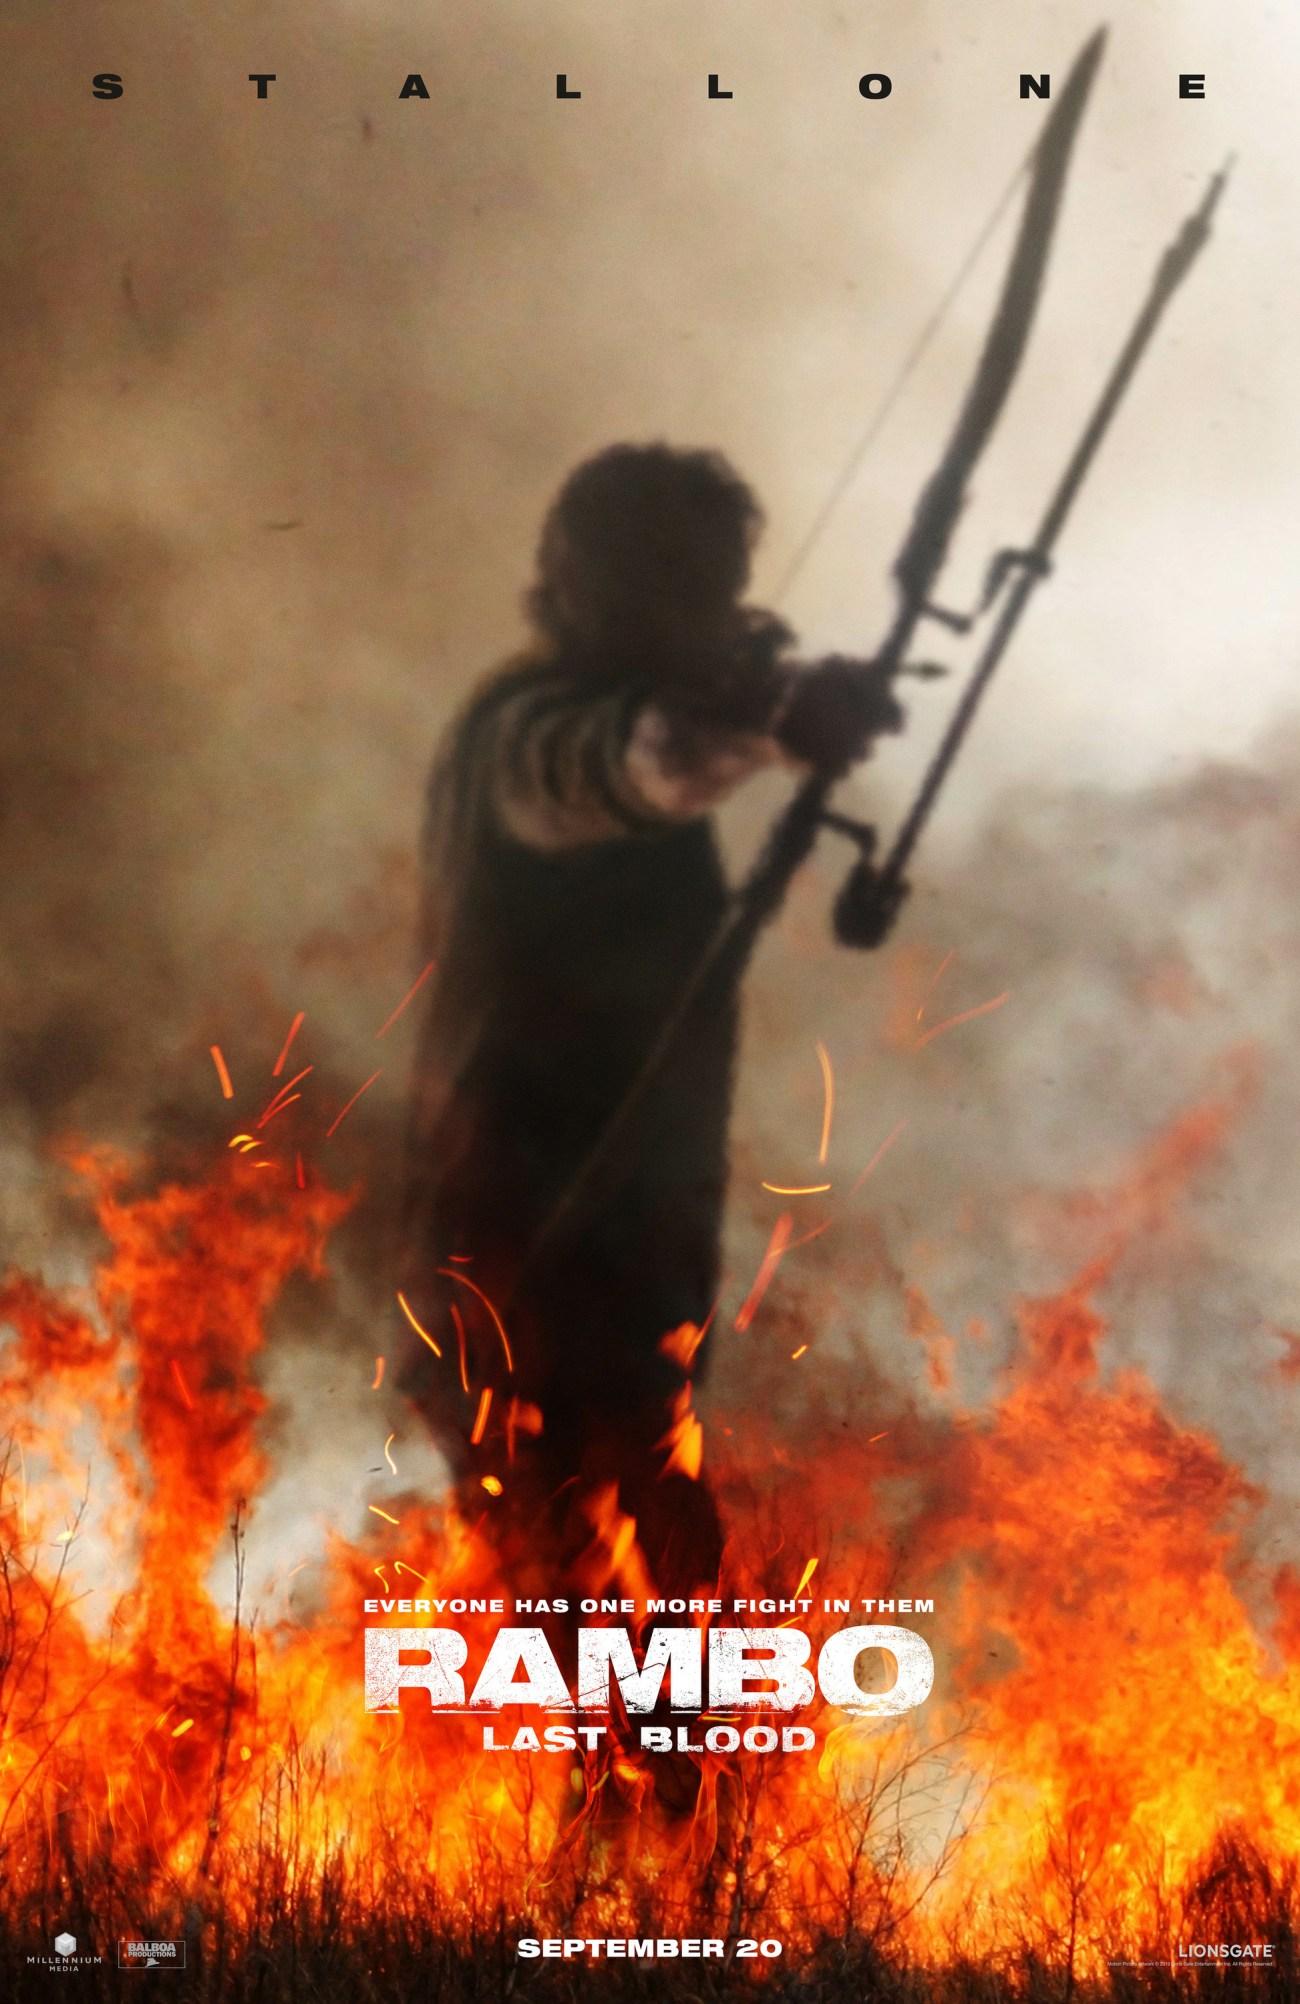 Póster de Rambo: The Last Blood (2019). Imagen: impawards.com